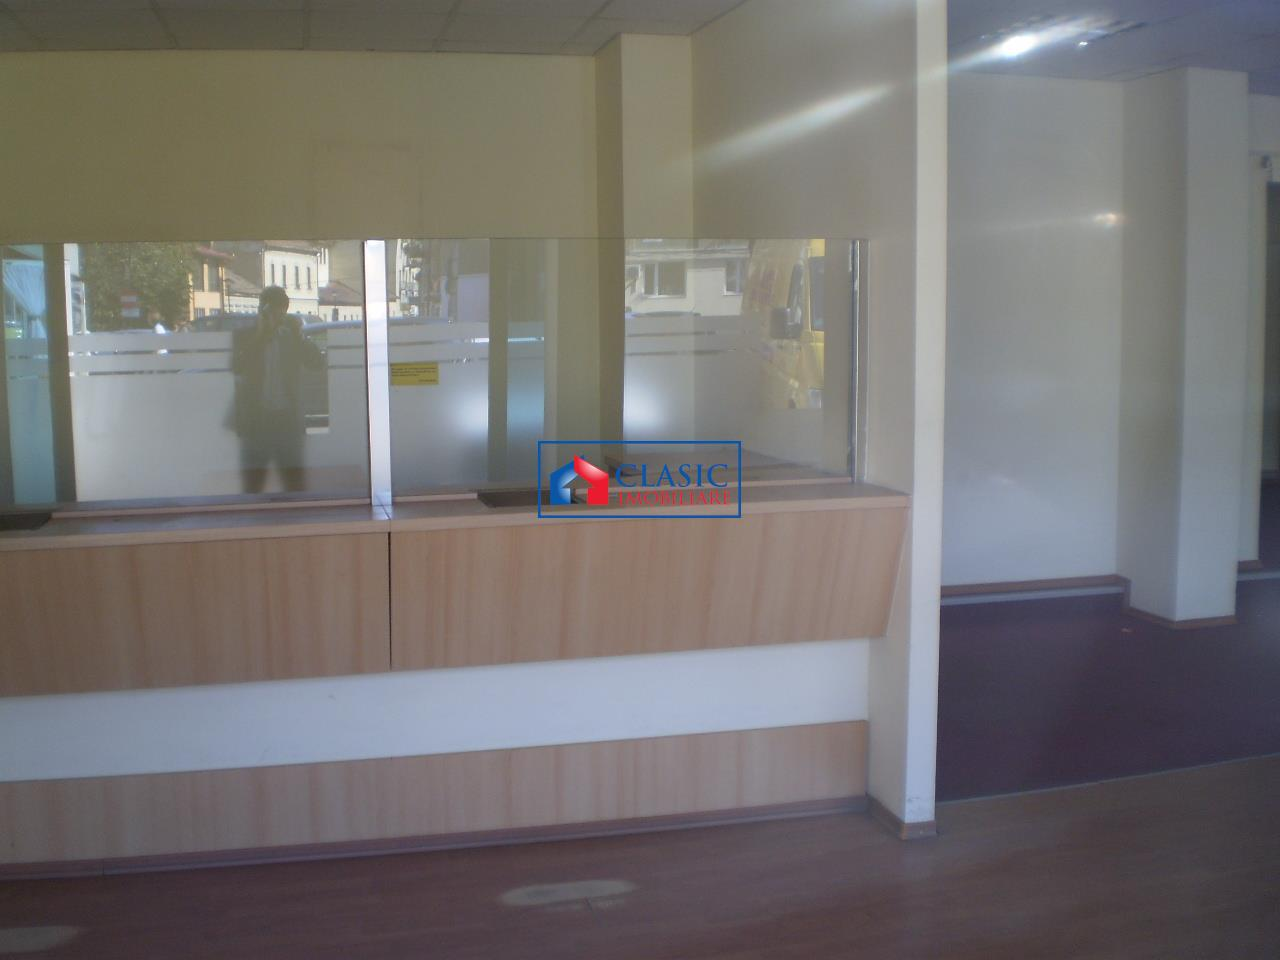 150 mp Spatiu birouri sau comercial Ultracentral, Cluj-Napoca